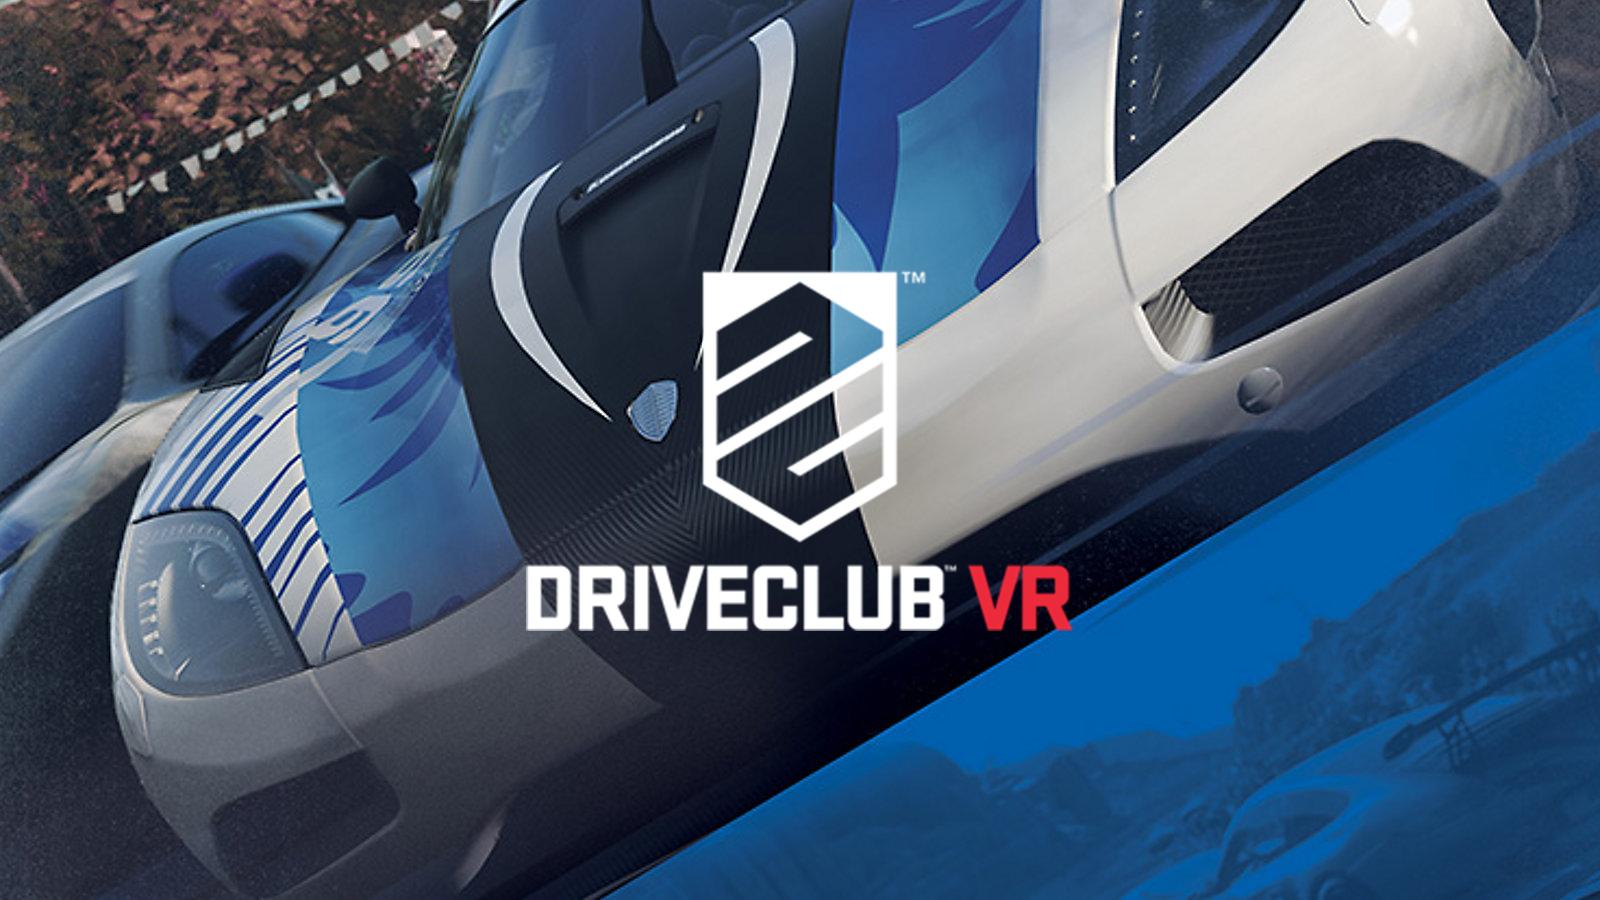 Playstation Drive Club VR Review playstation.com vr porn blog virtual reality